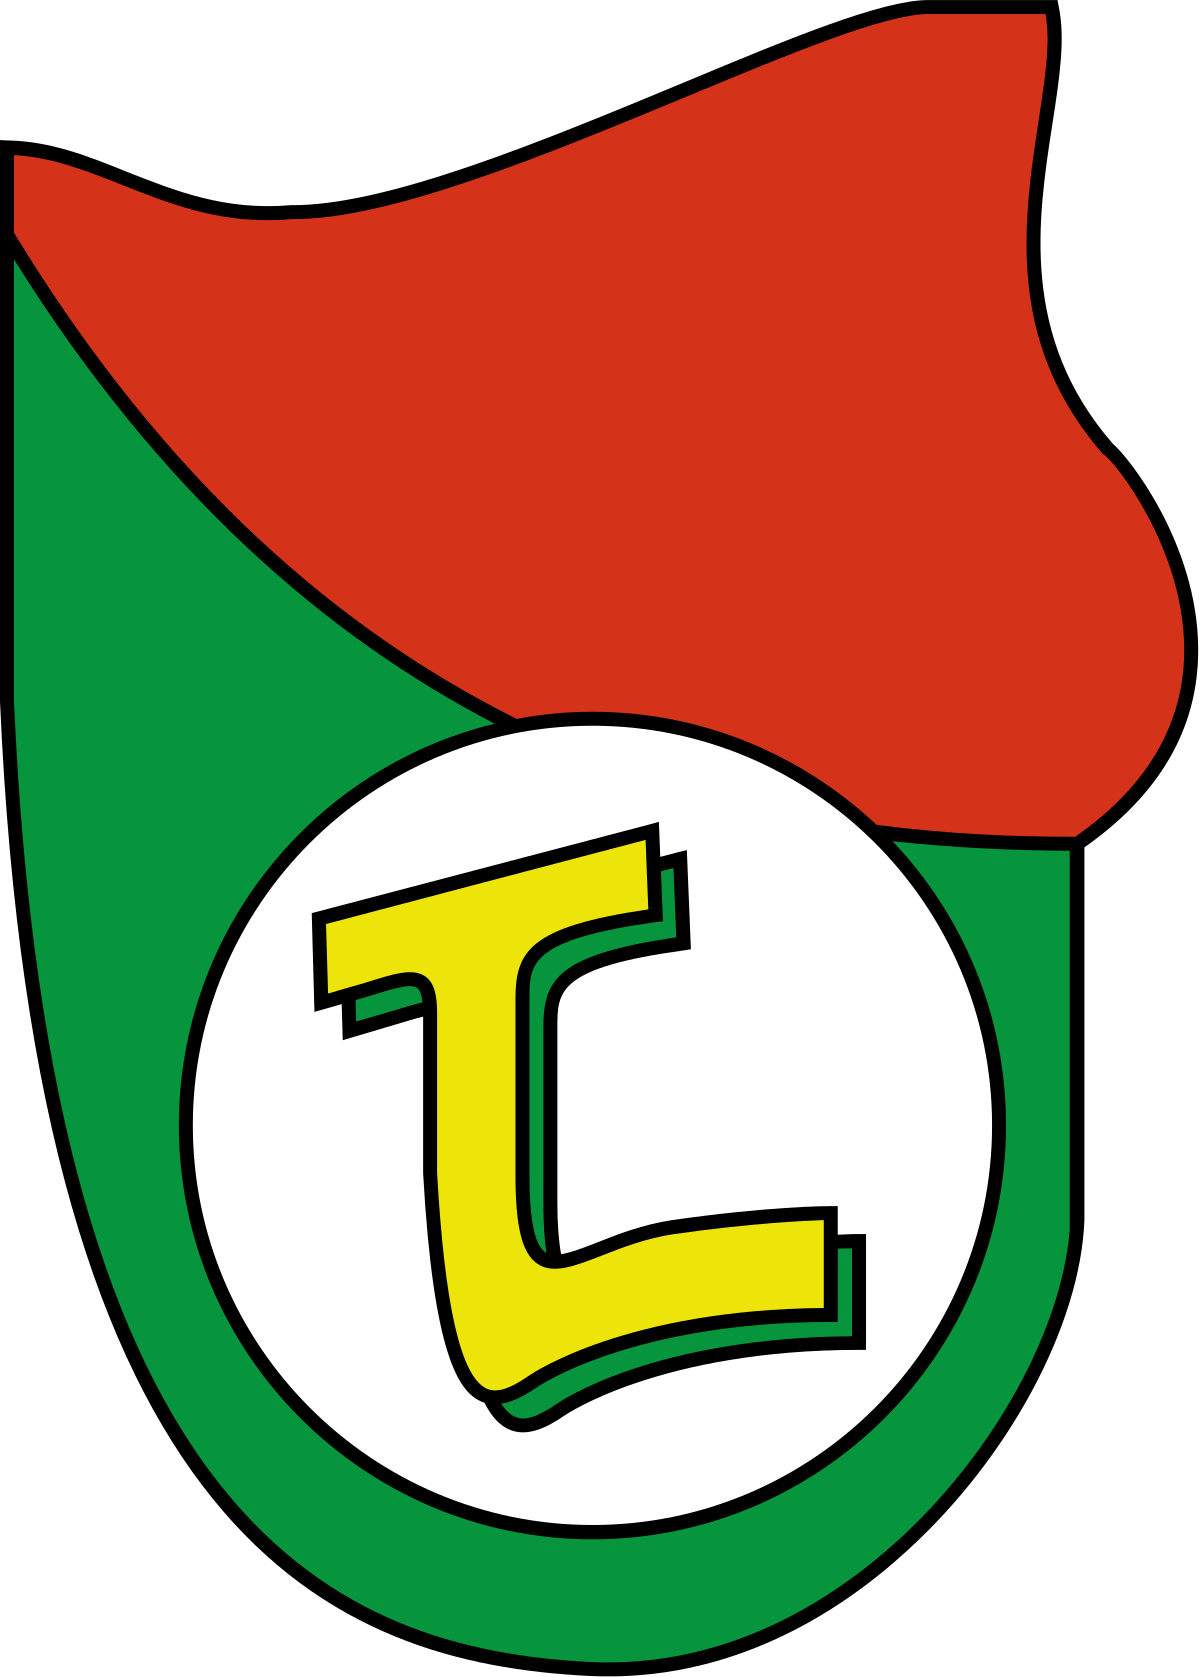 Kf lushnja albania sports logos pinterest sports logos kf lushnja albania buycottarizona